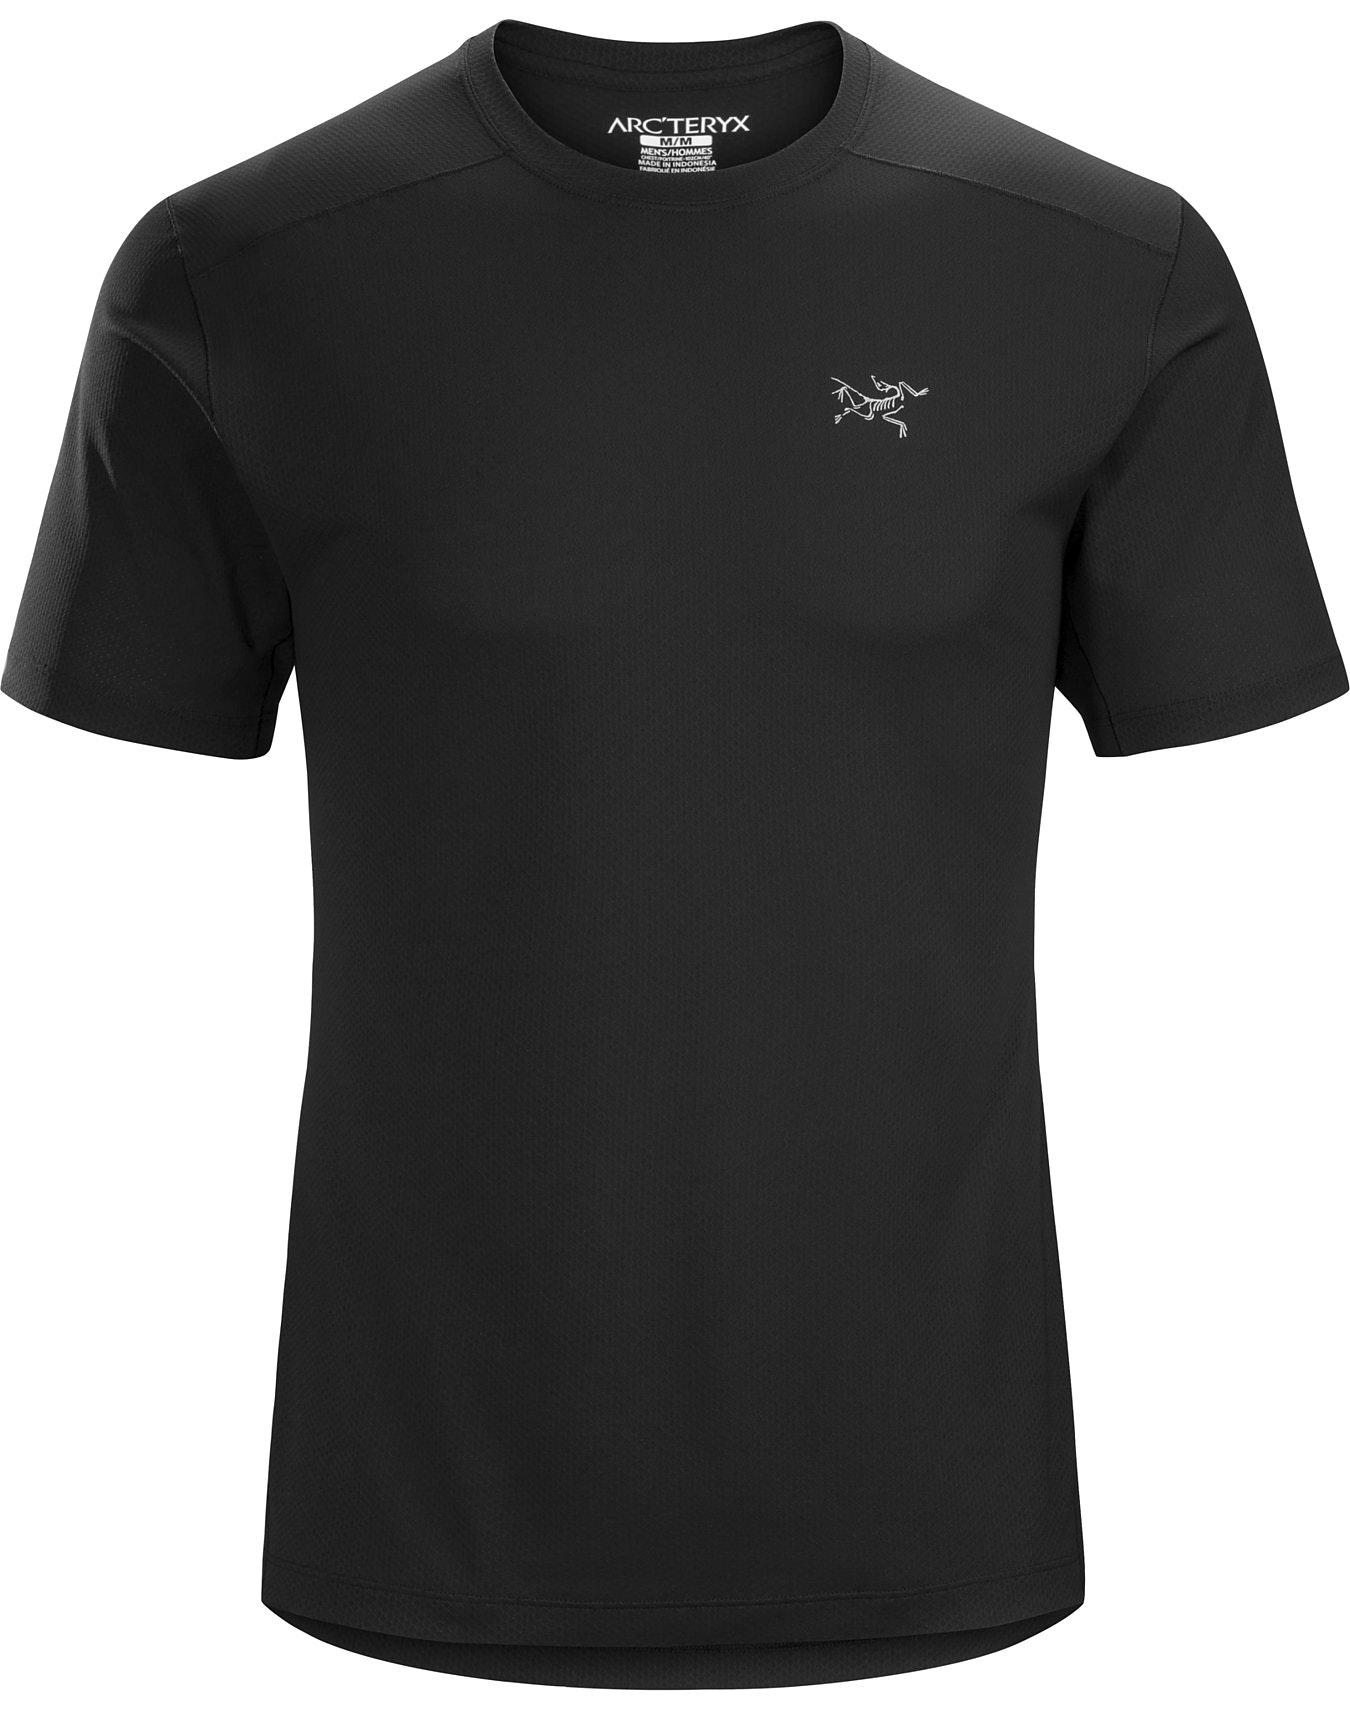 269a311b Velox Crew T-skjorte / Herre / Arc'teryx